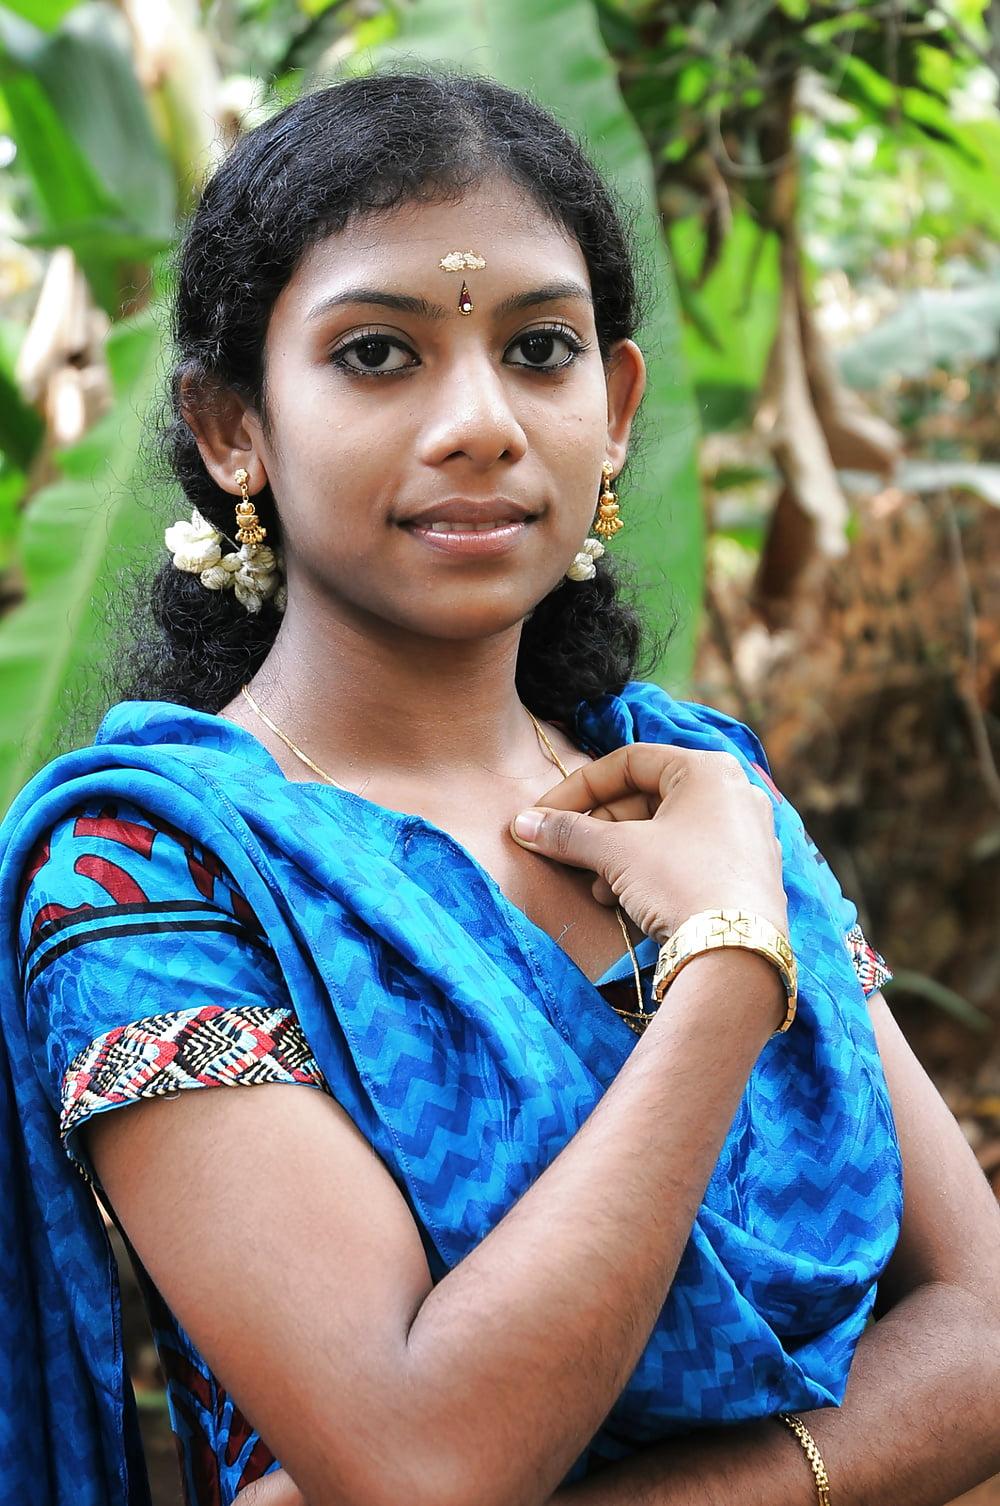 Kerala girls rep vidoi free dolound, flat chested video